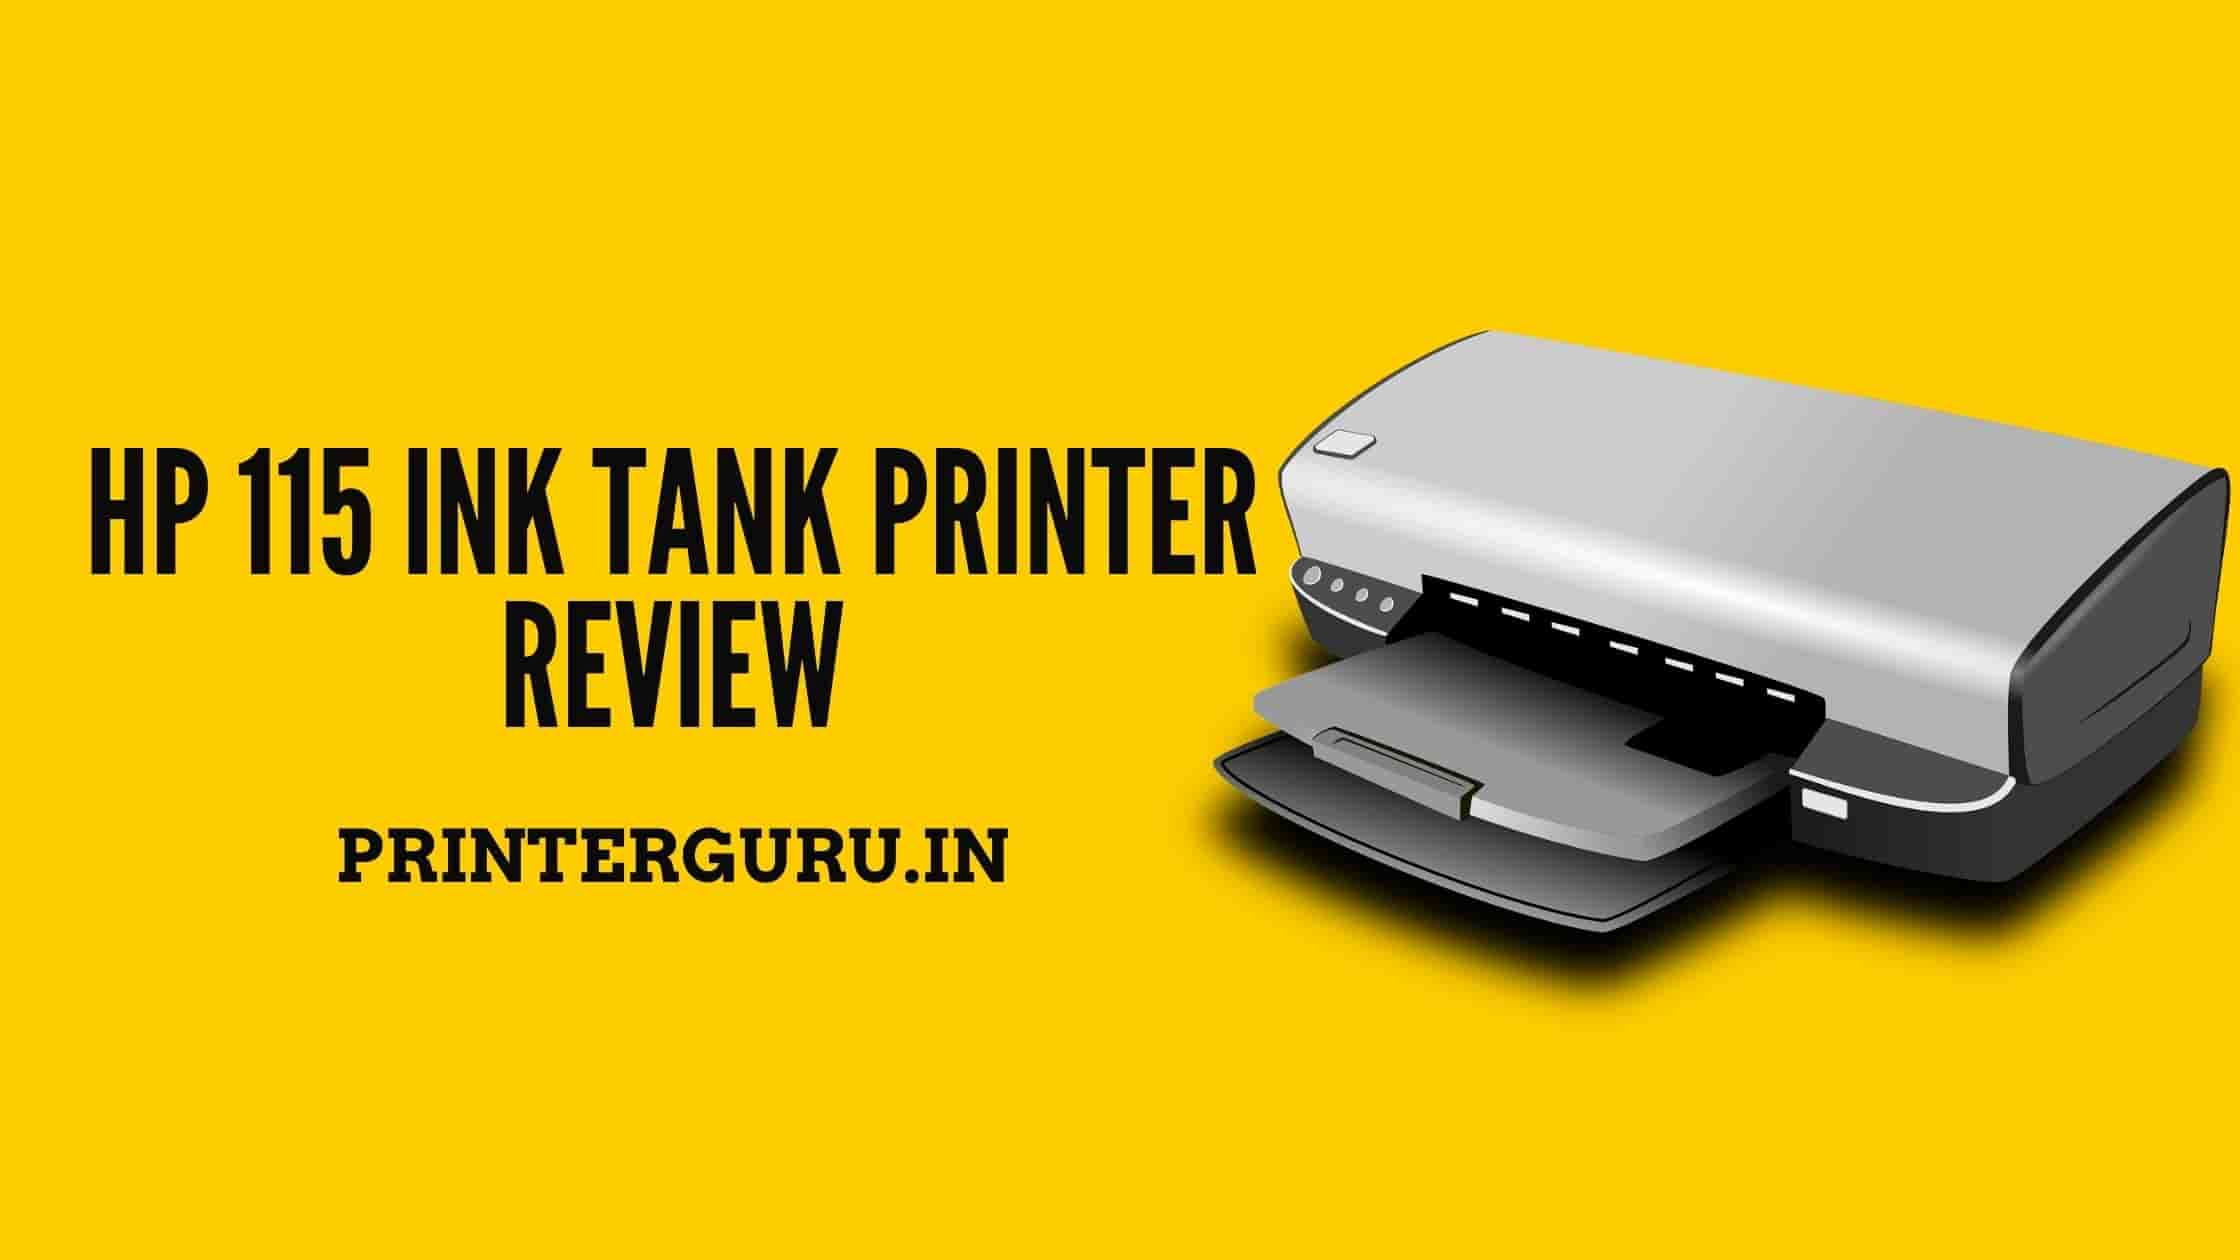 HP 115 Printer Review